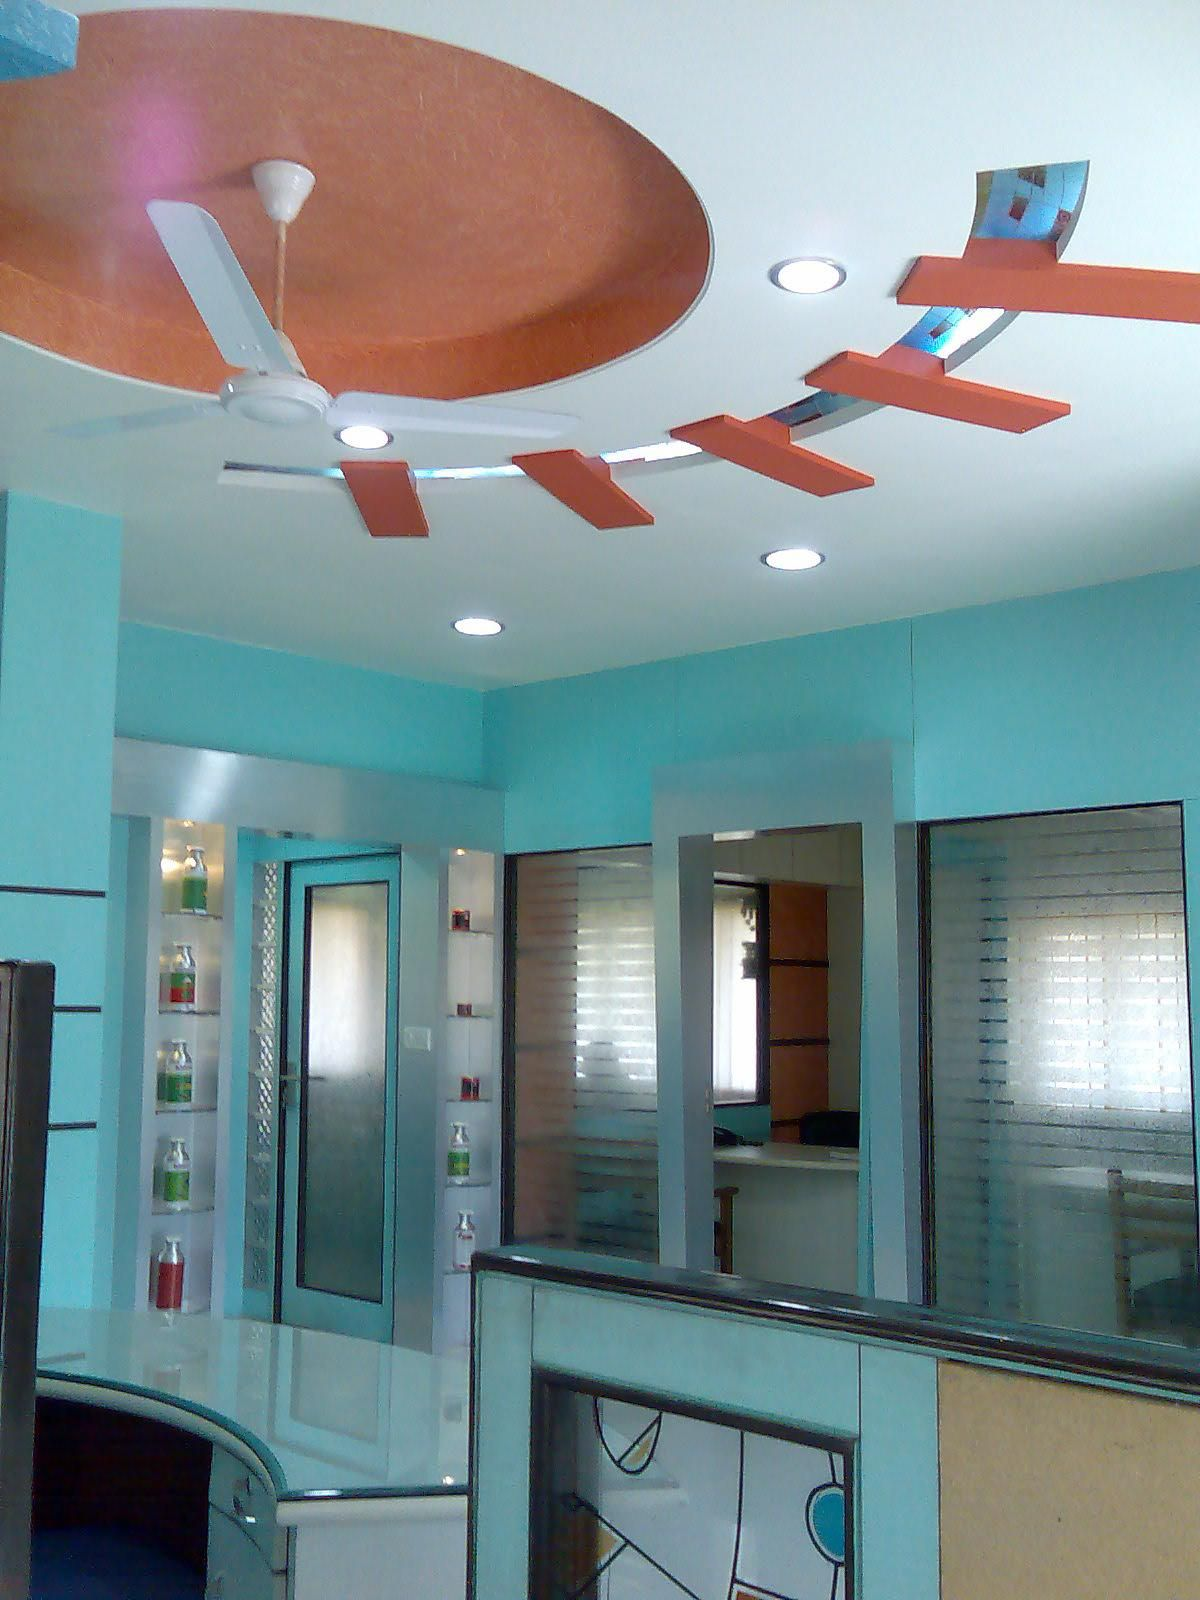 Living room ceiling design - GharExpert | Home Decoration ...